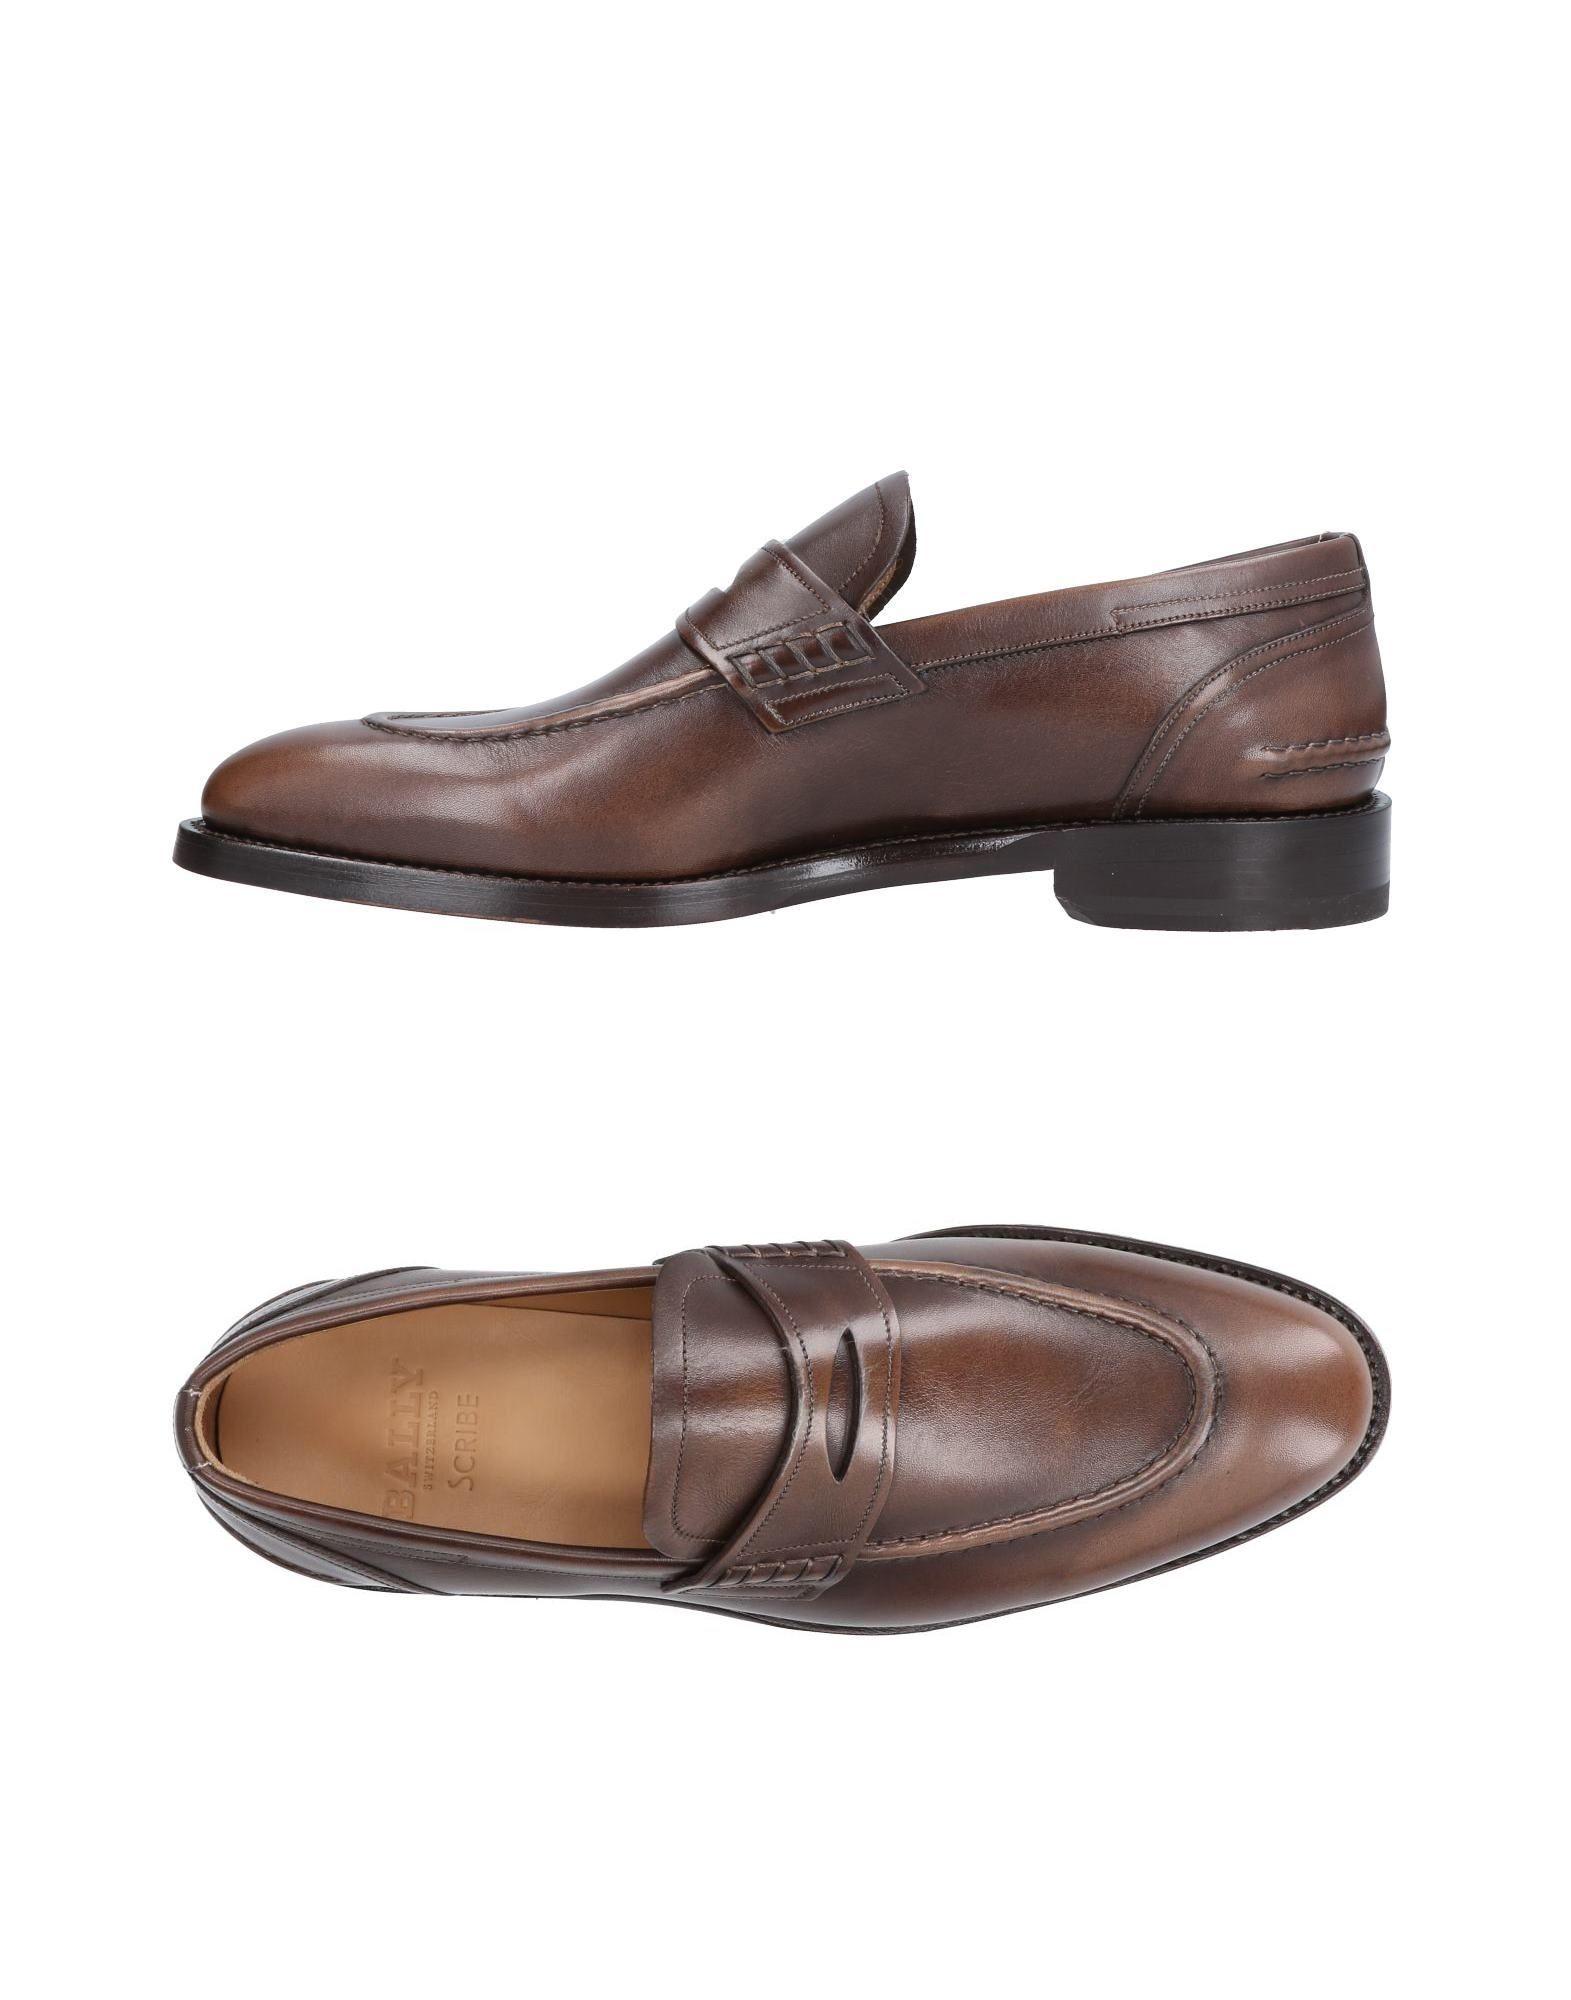 Bally Mokassins Herren  11483459OH Gute Qualität beliebte Schuhe